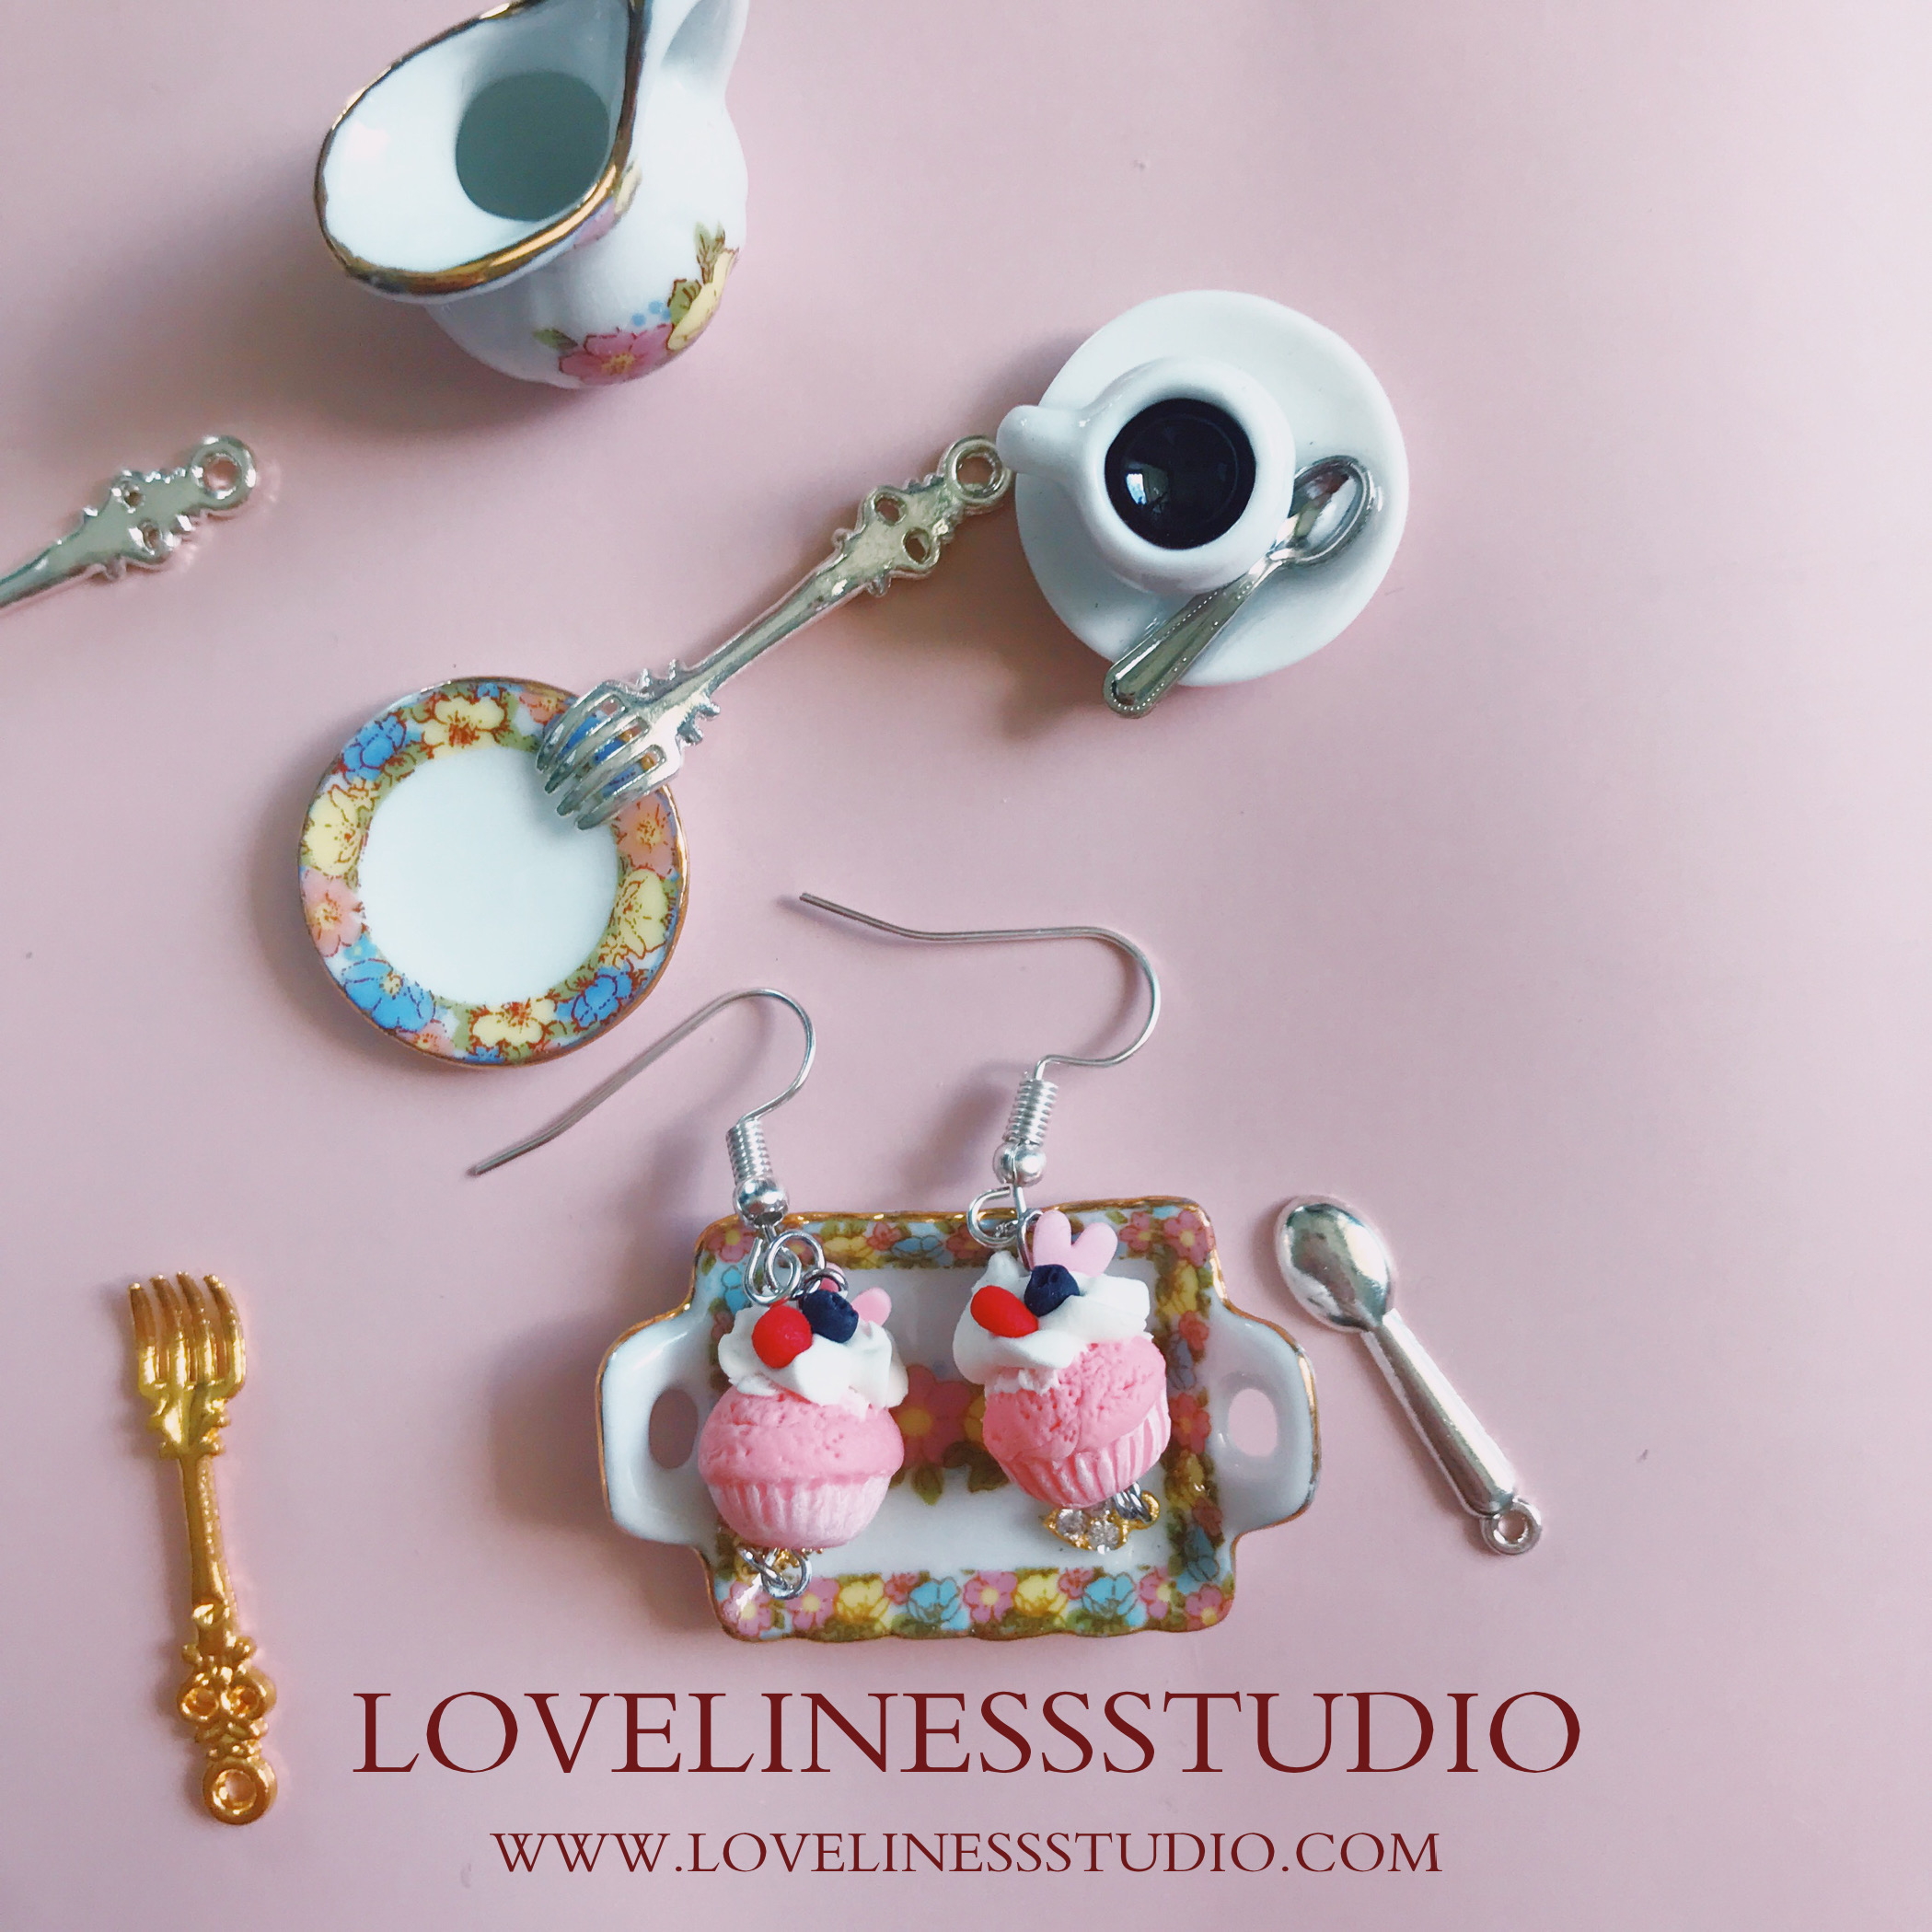 Loveliness Studio